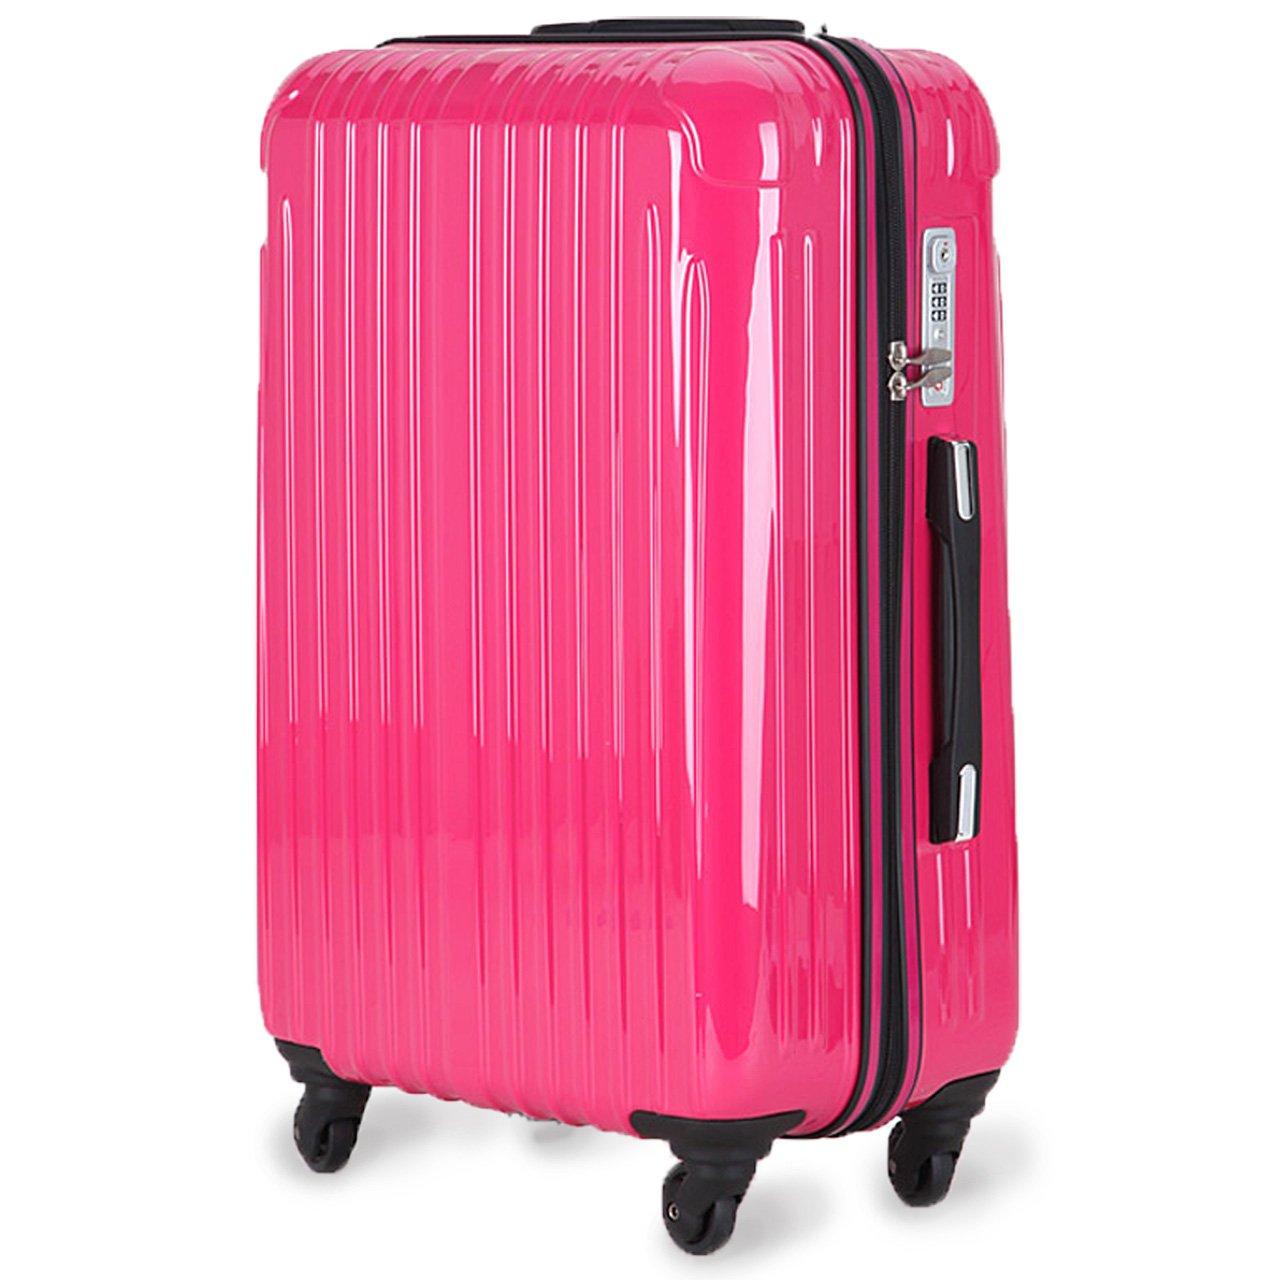 strike[ストライク]超軽量 2年保証 スーツケース TSAロック搭載 旅行バック トランクケース 旅行カバン B075CK9G74 中型アウトレット|マゼンタ マゼンタ 中型アウトレット